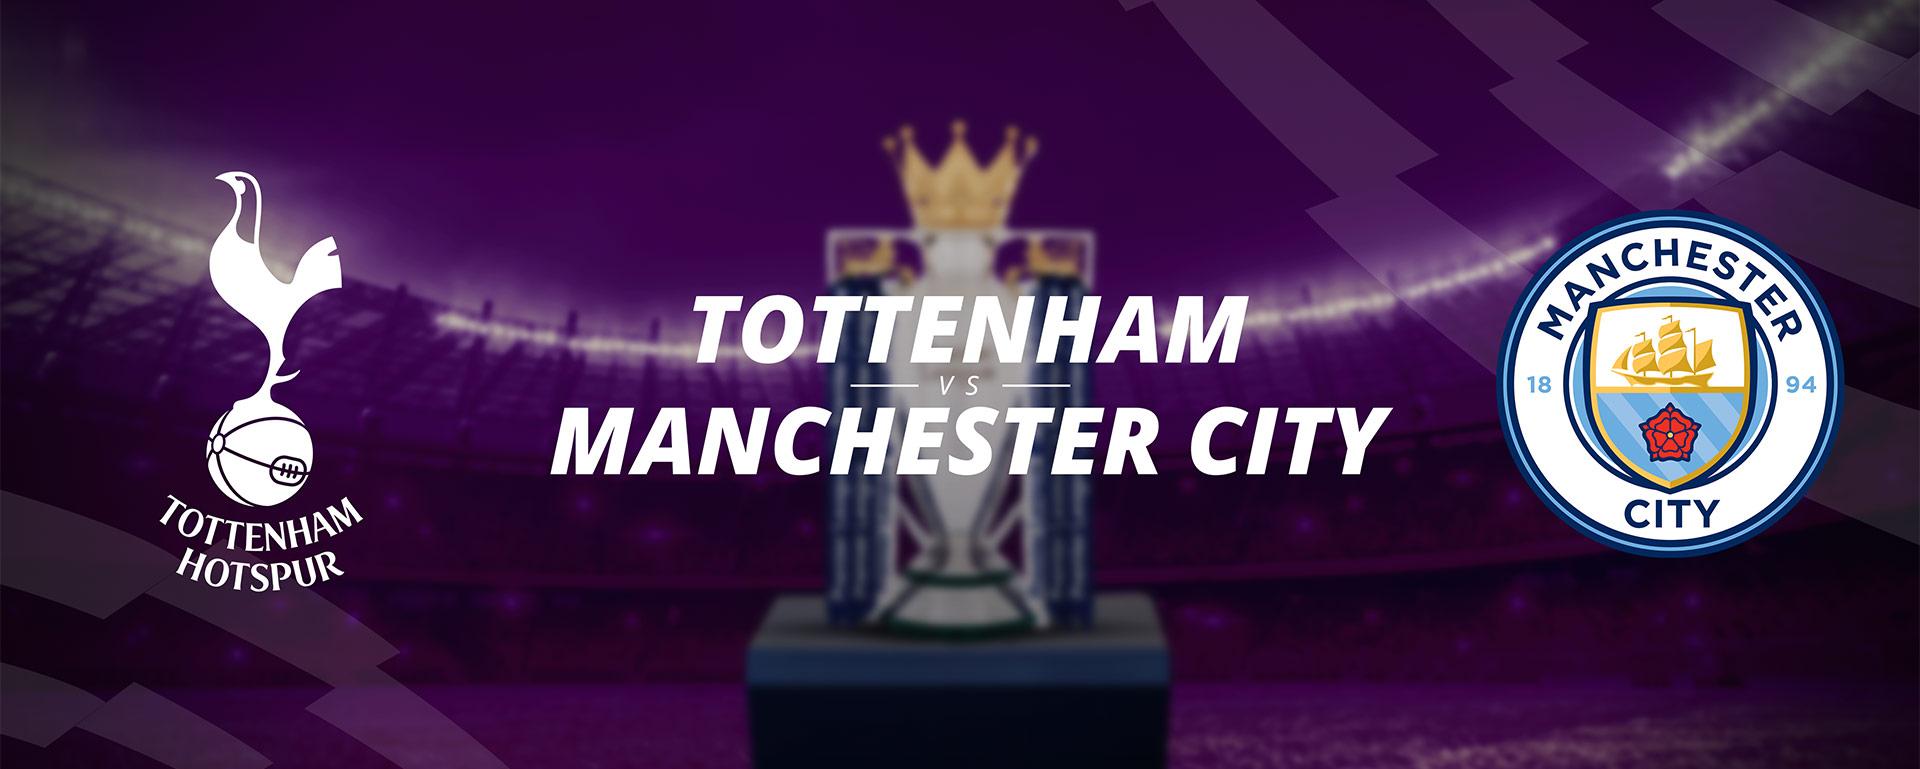 TOTTENHAM VS MANCHESTER CITY: BETTING PREVIEW